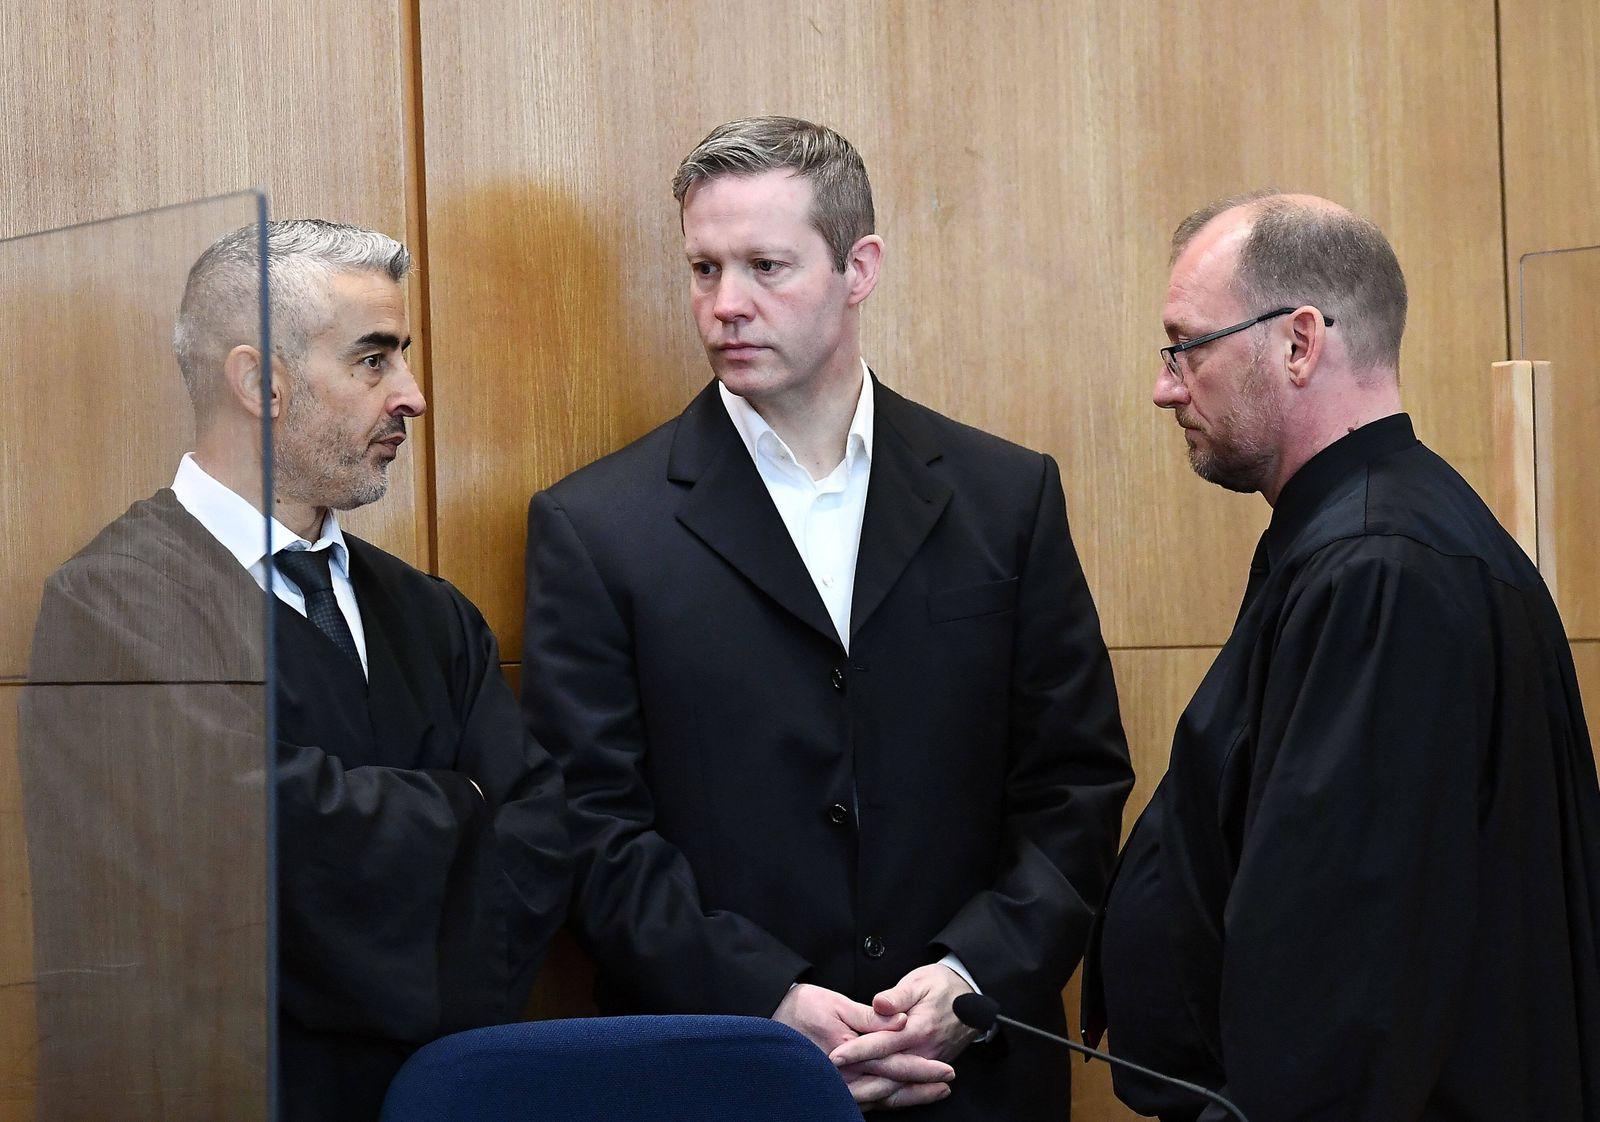 03.09.2020, xjhx, News Lokales, Prozess: Tod von Dr. Walter Luebcke - deloka, emonline, delahe emspor, v.l. Angeklagter